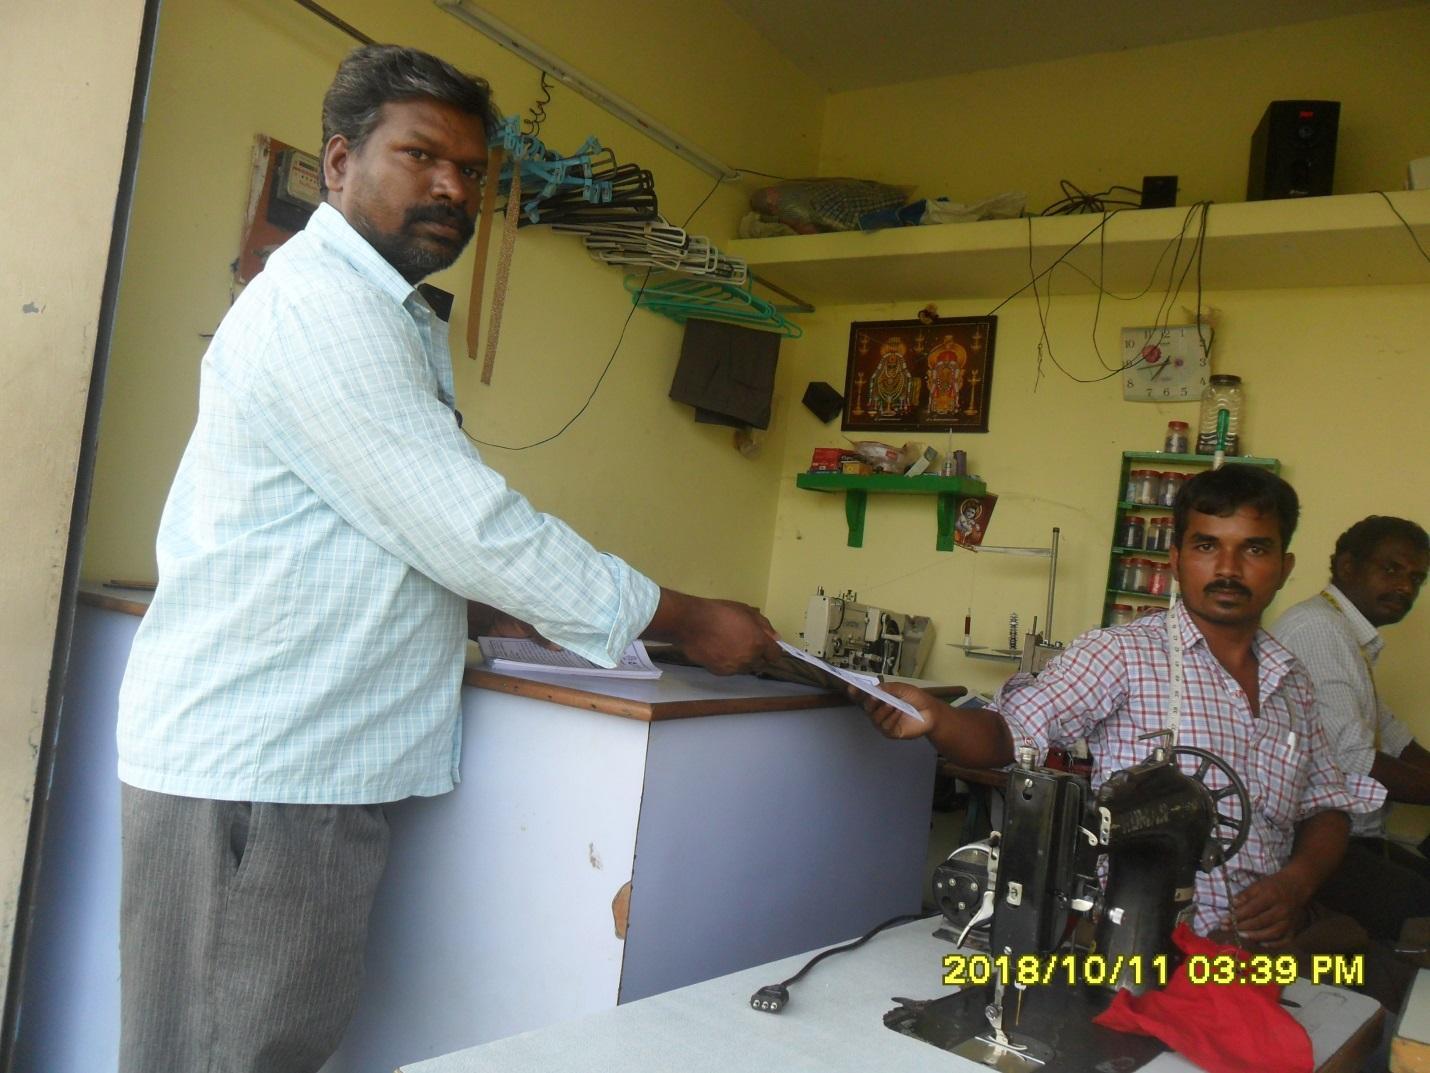 C:\Users\Elcot\Desktop\Outreach Meeting\October\Tiruvannamalai\SAM_0764 - Consumer Tiruvannamalai.JPG